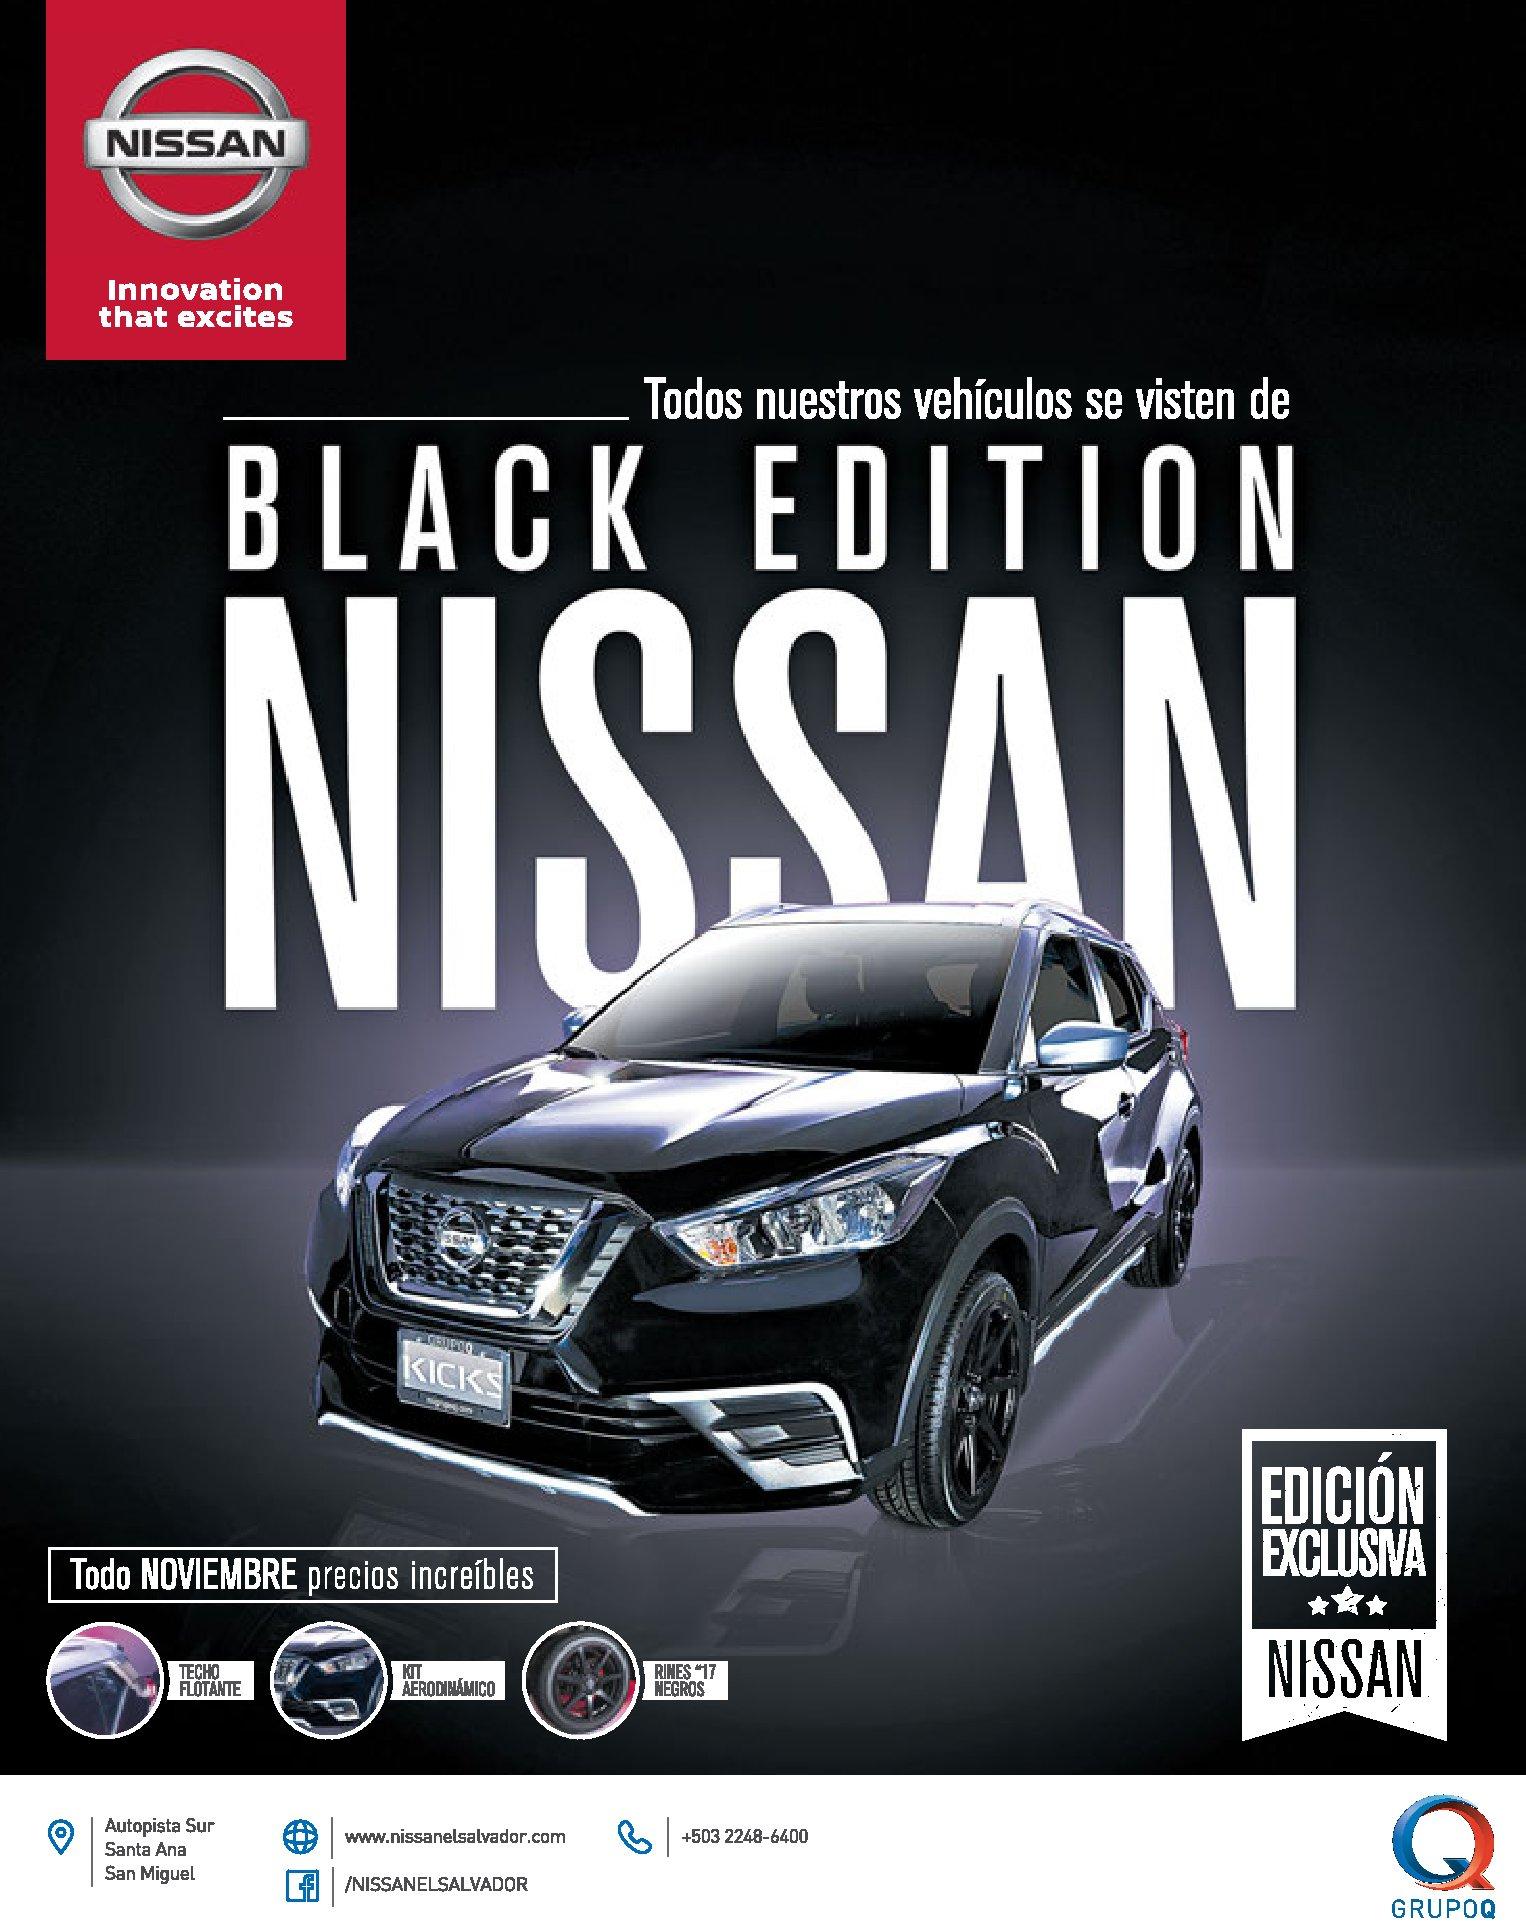 NISSAN Black friday edition 2017 modelo exclusivo KICKS